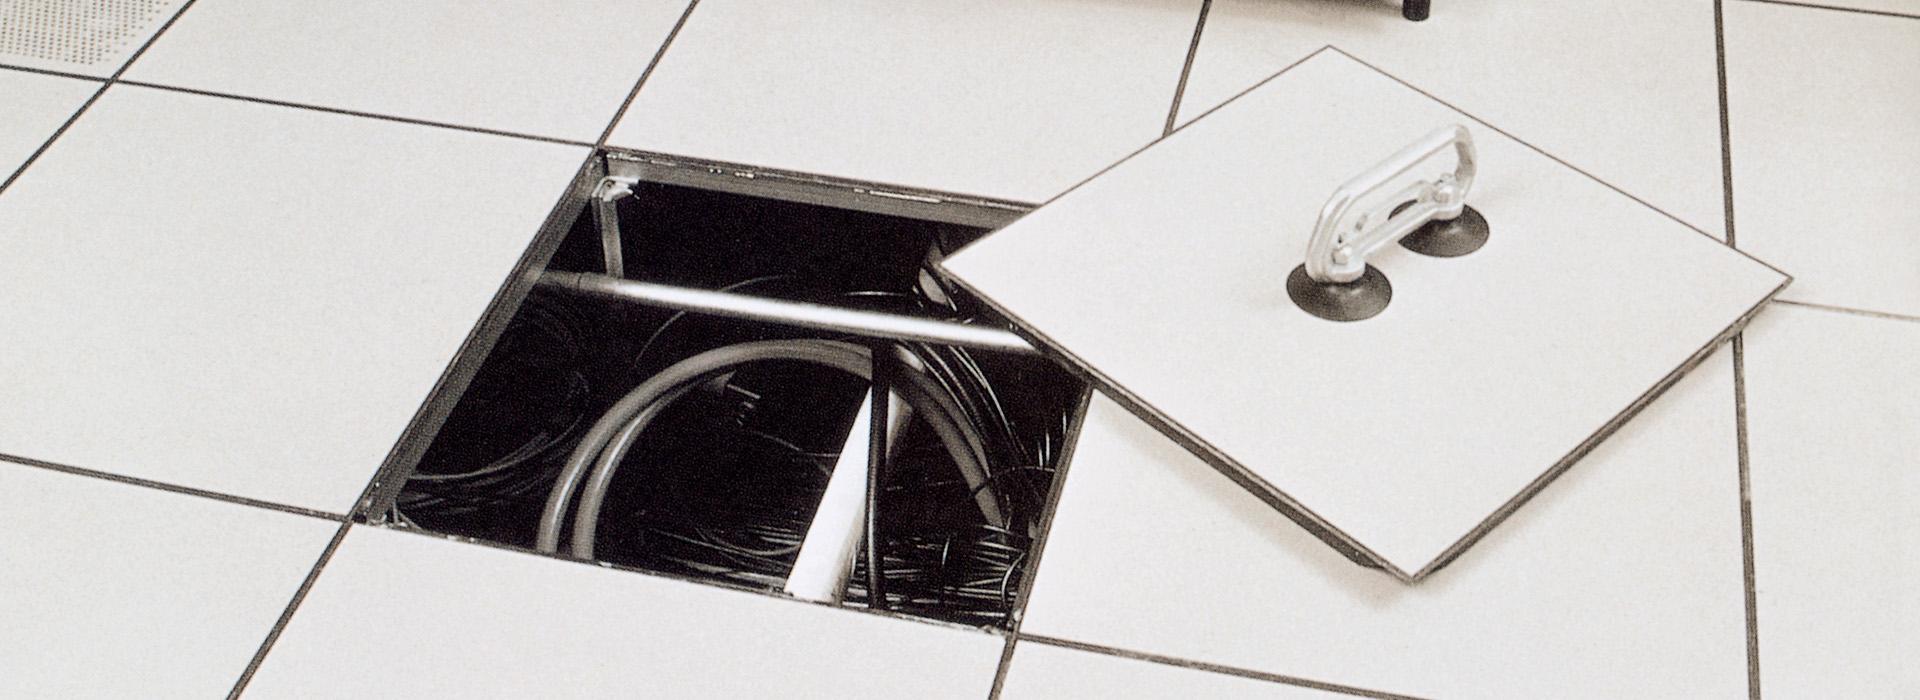 Formica Access Flooring